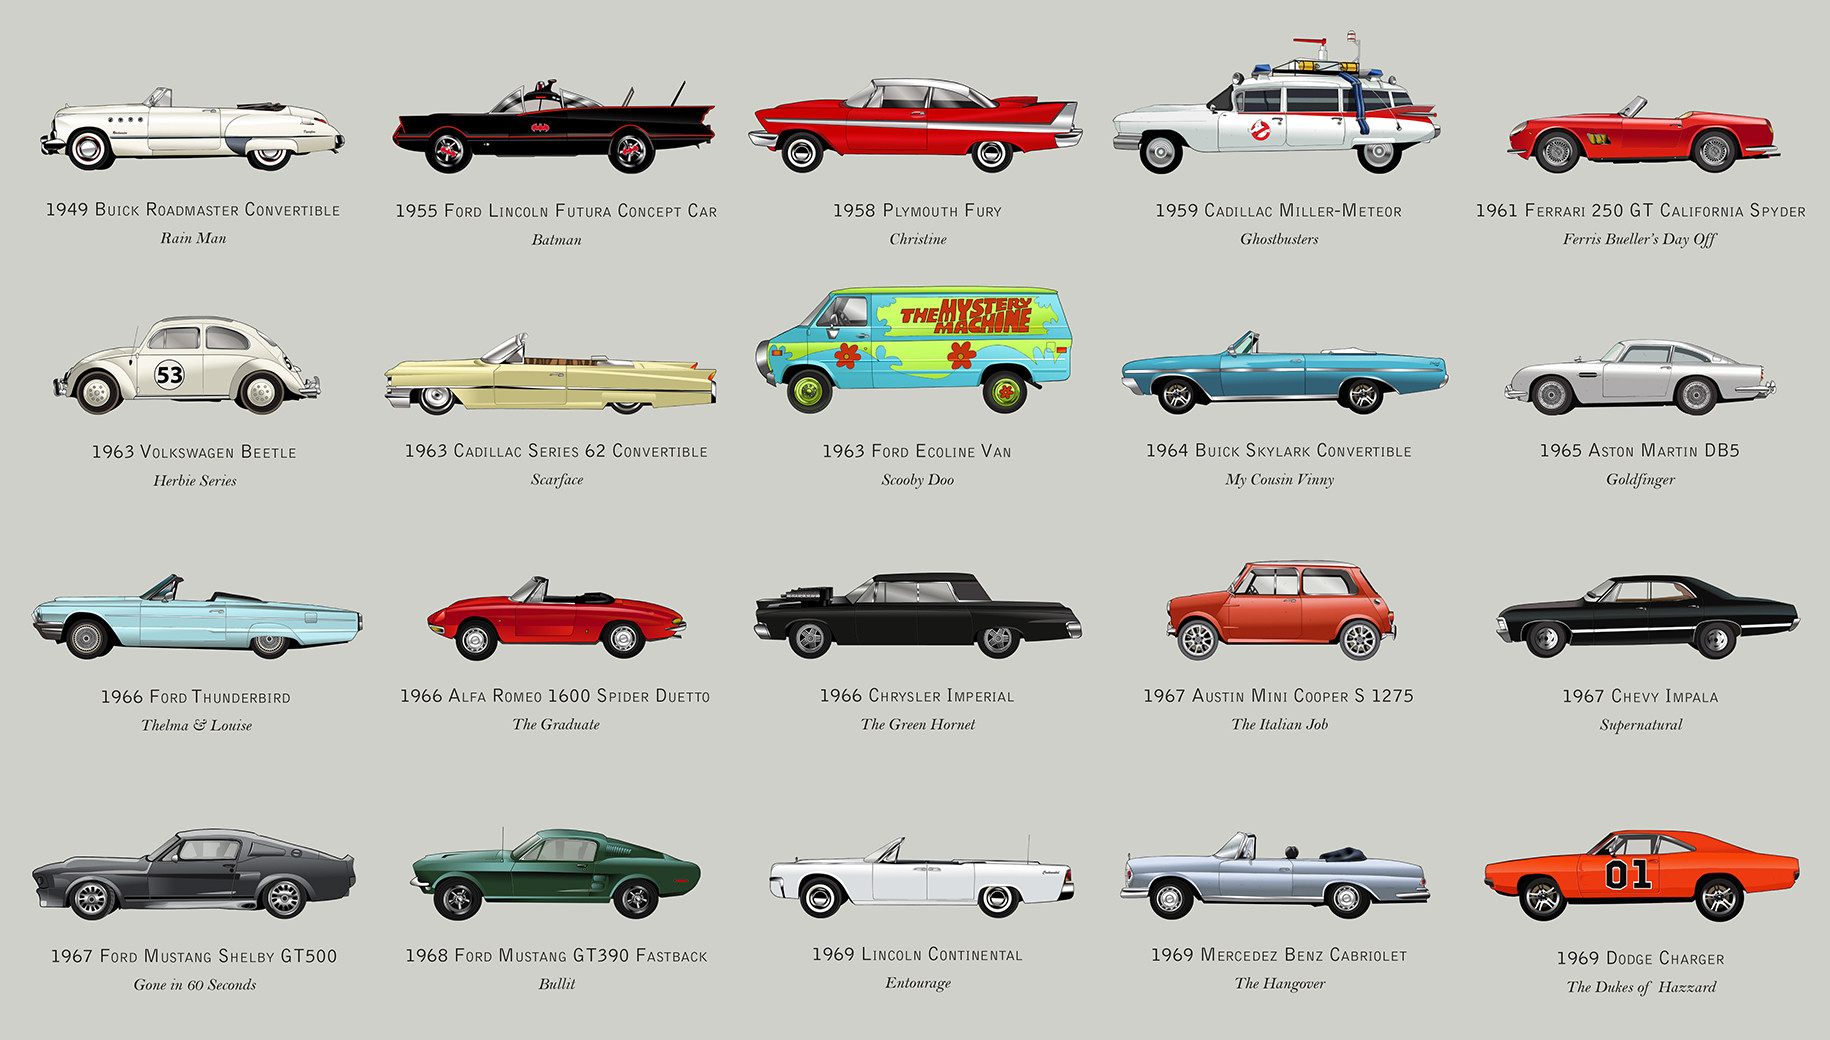 filmography_of_cars_3.jpg